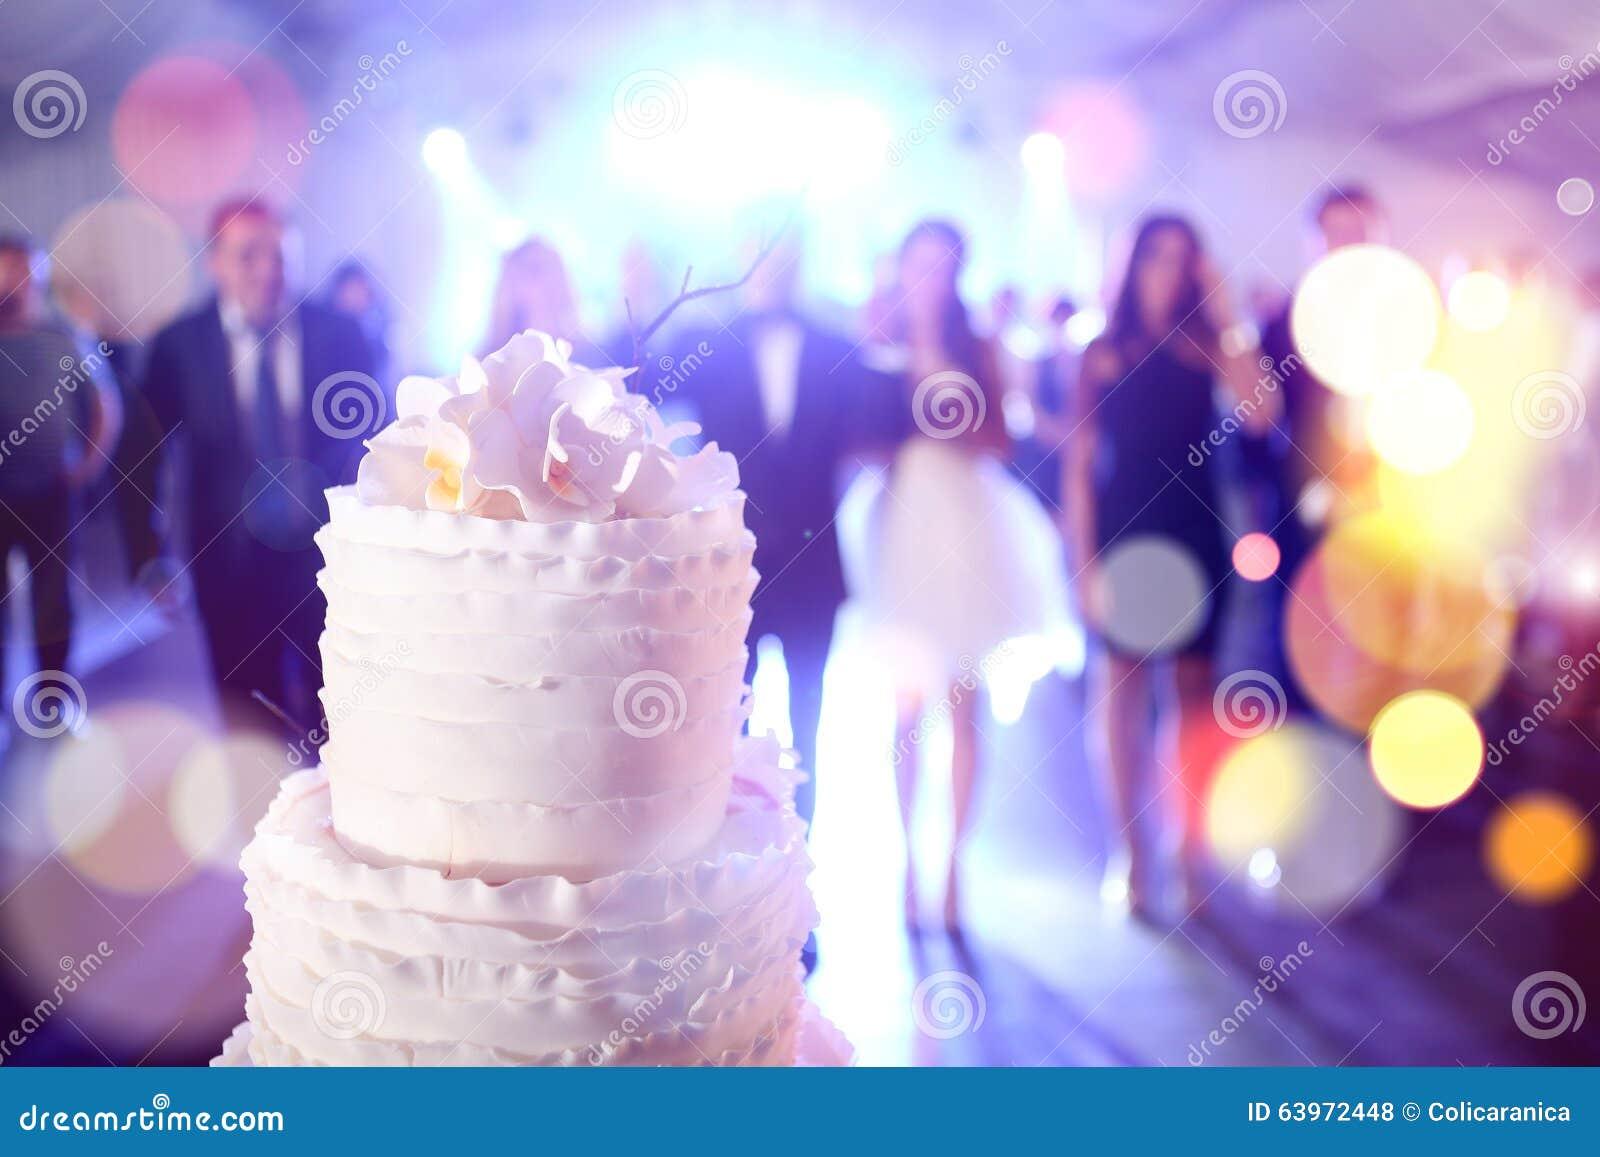 Grafico a torta 8 di cerimonia nuziale